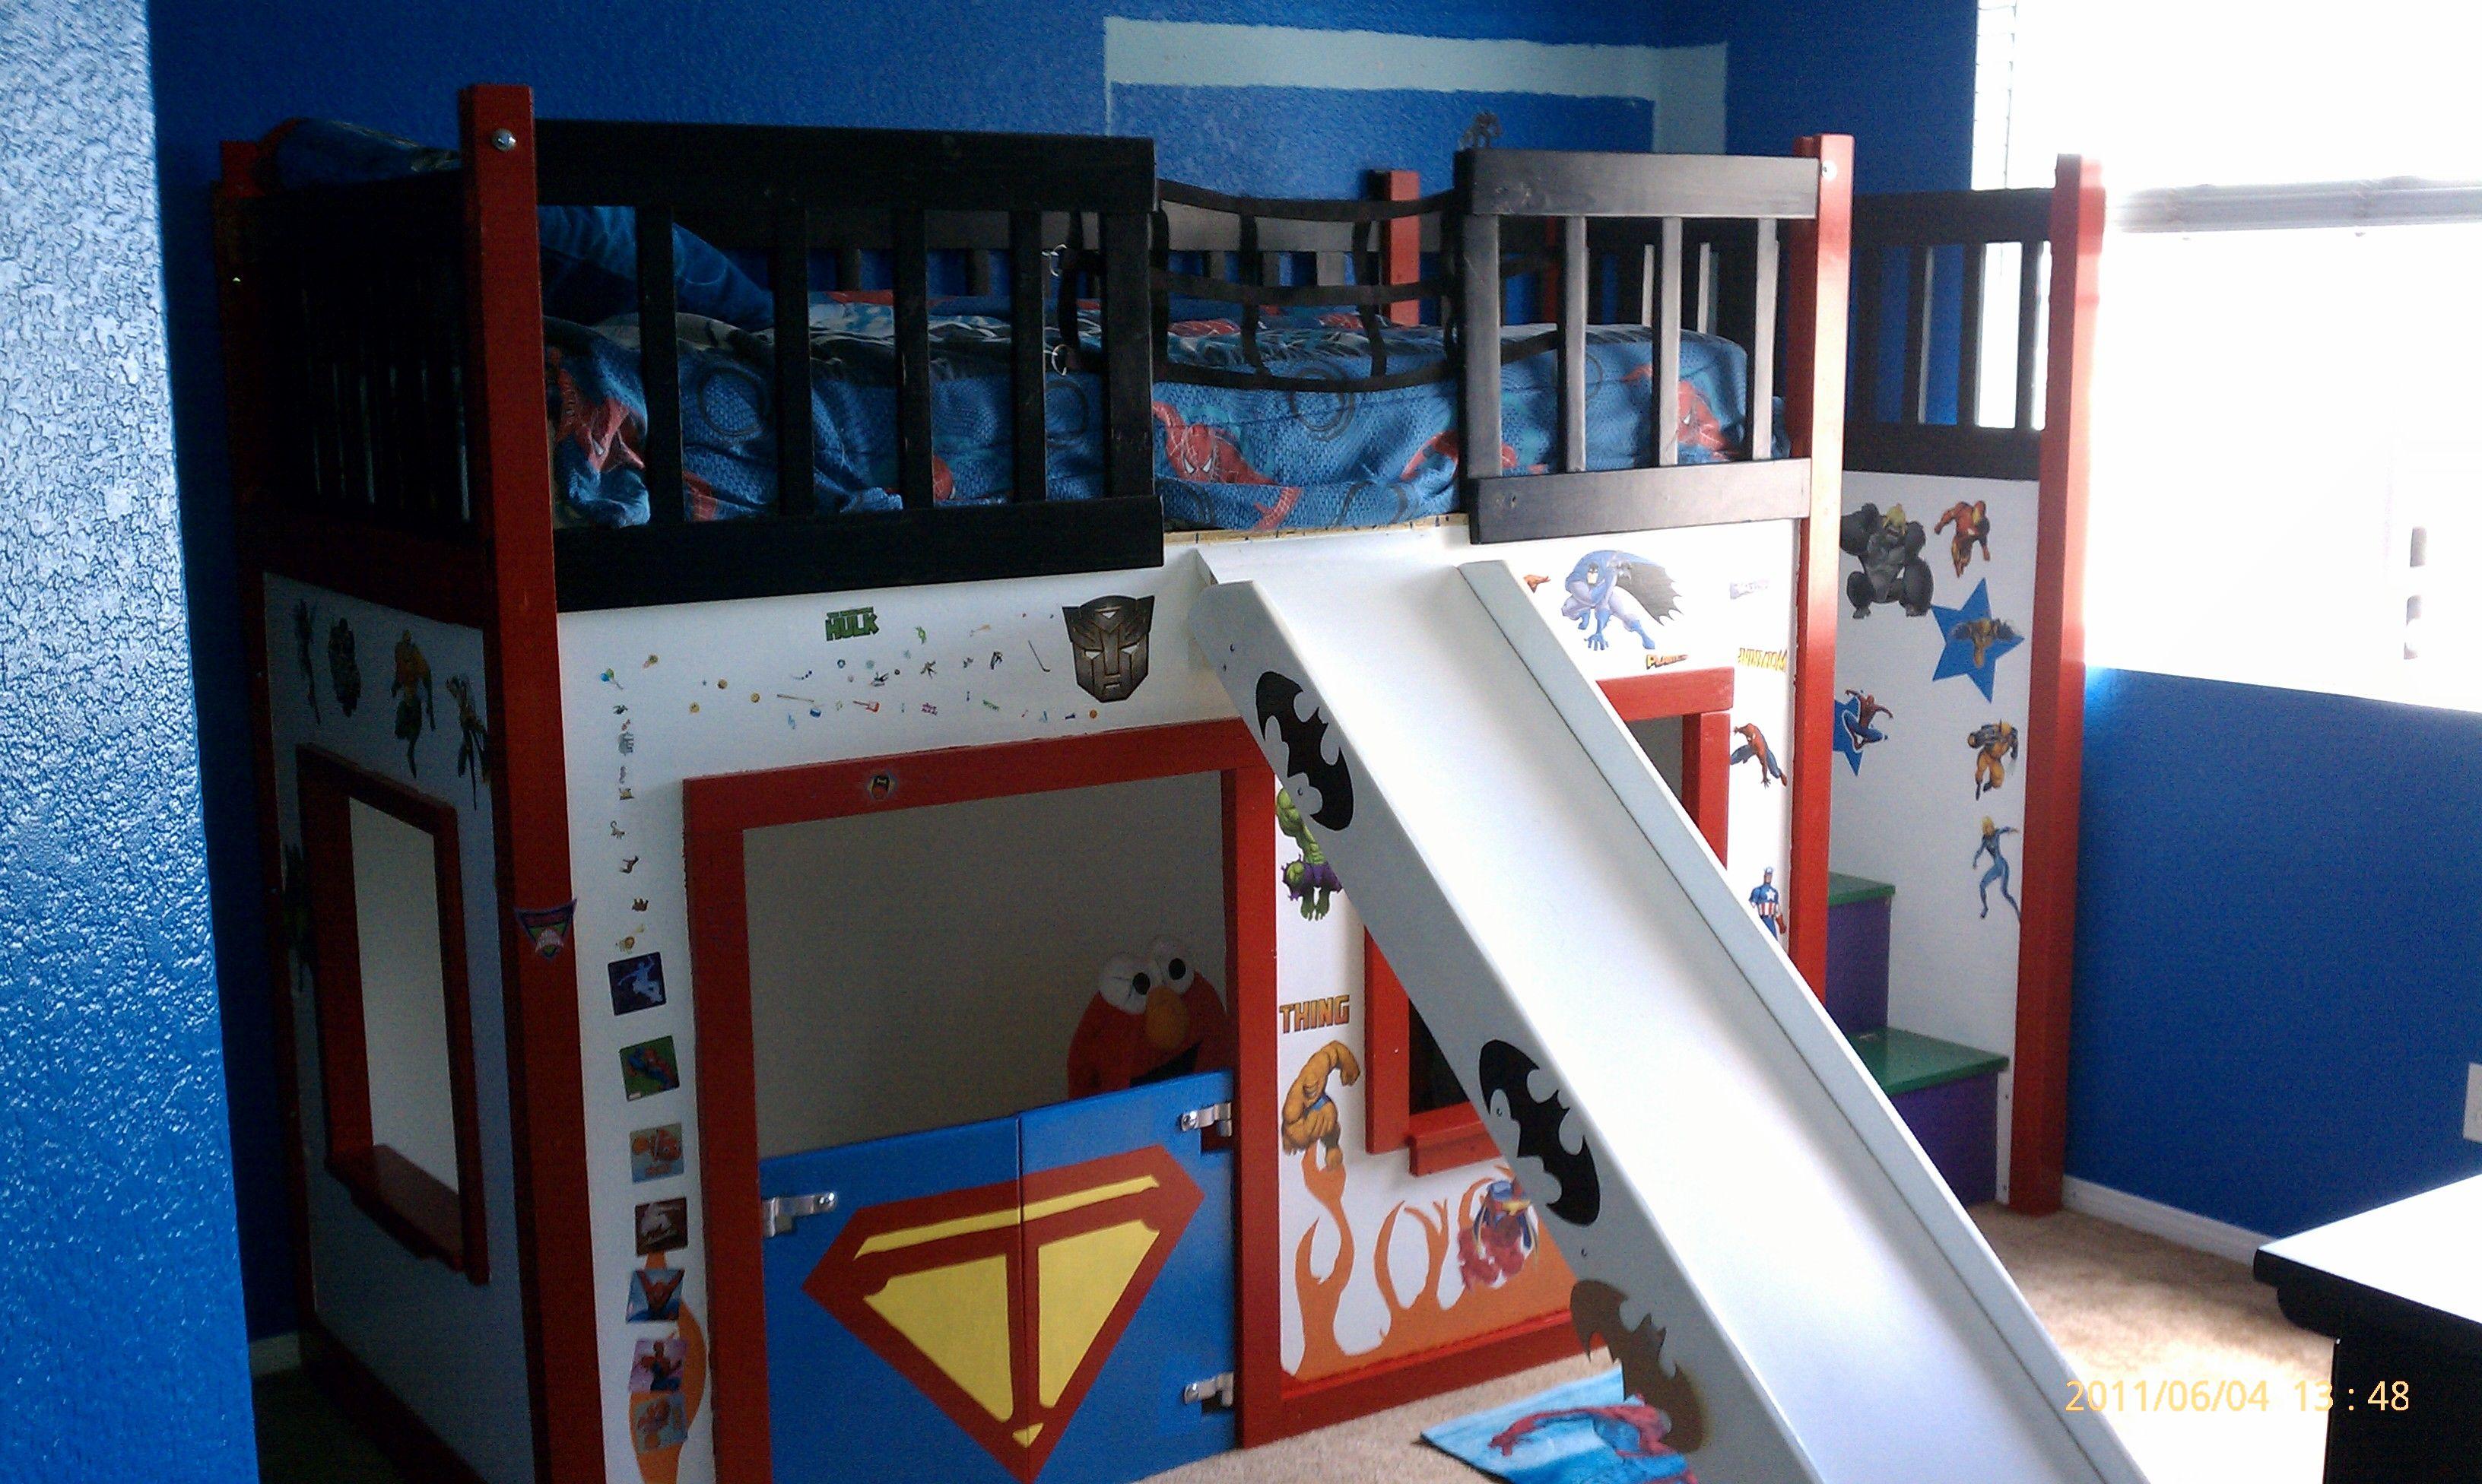 Fort Friday Play Room Ideas Playhouse Loft Bed Kid Beds Superhero Room